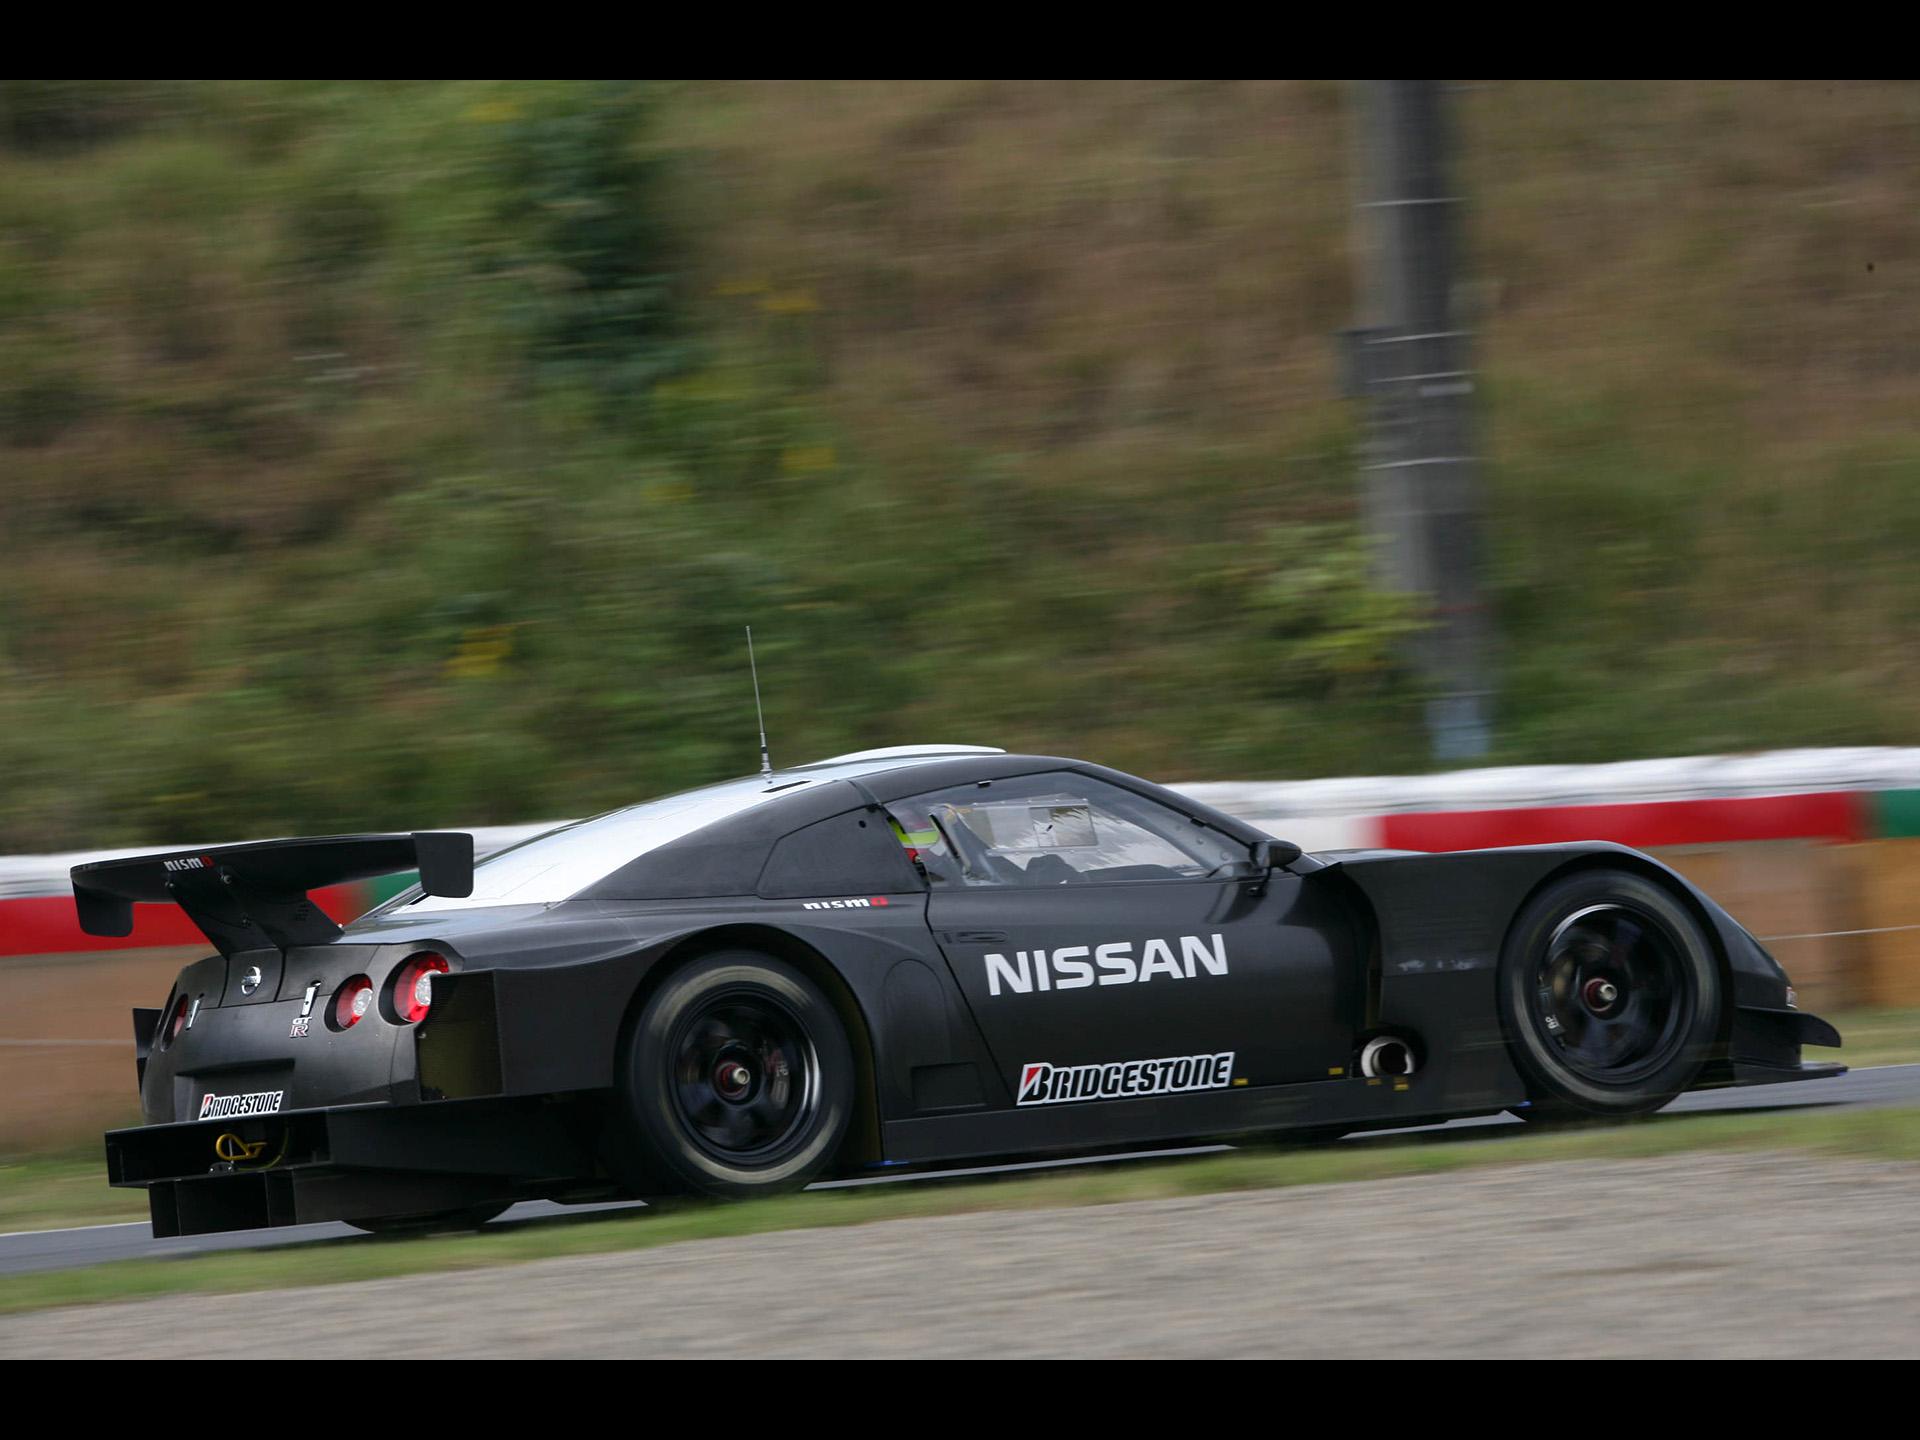 Nissan GT-R GT500 photo 50245